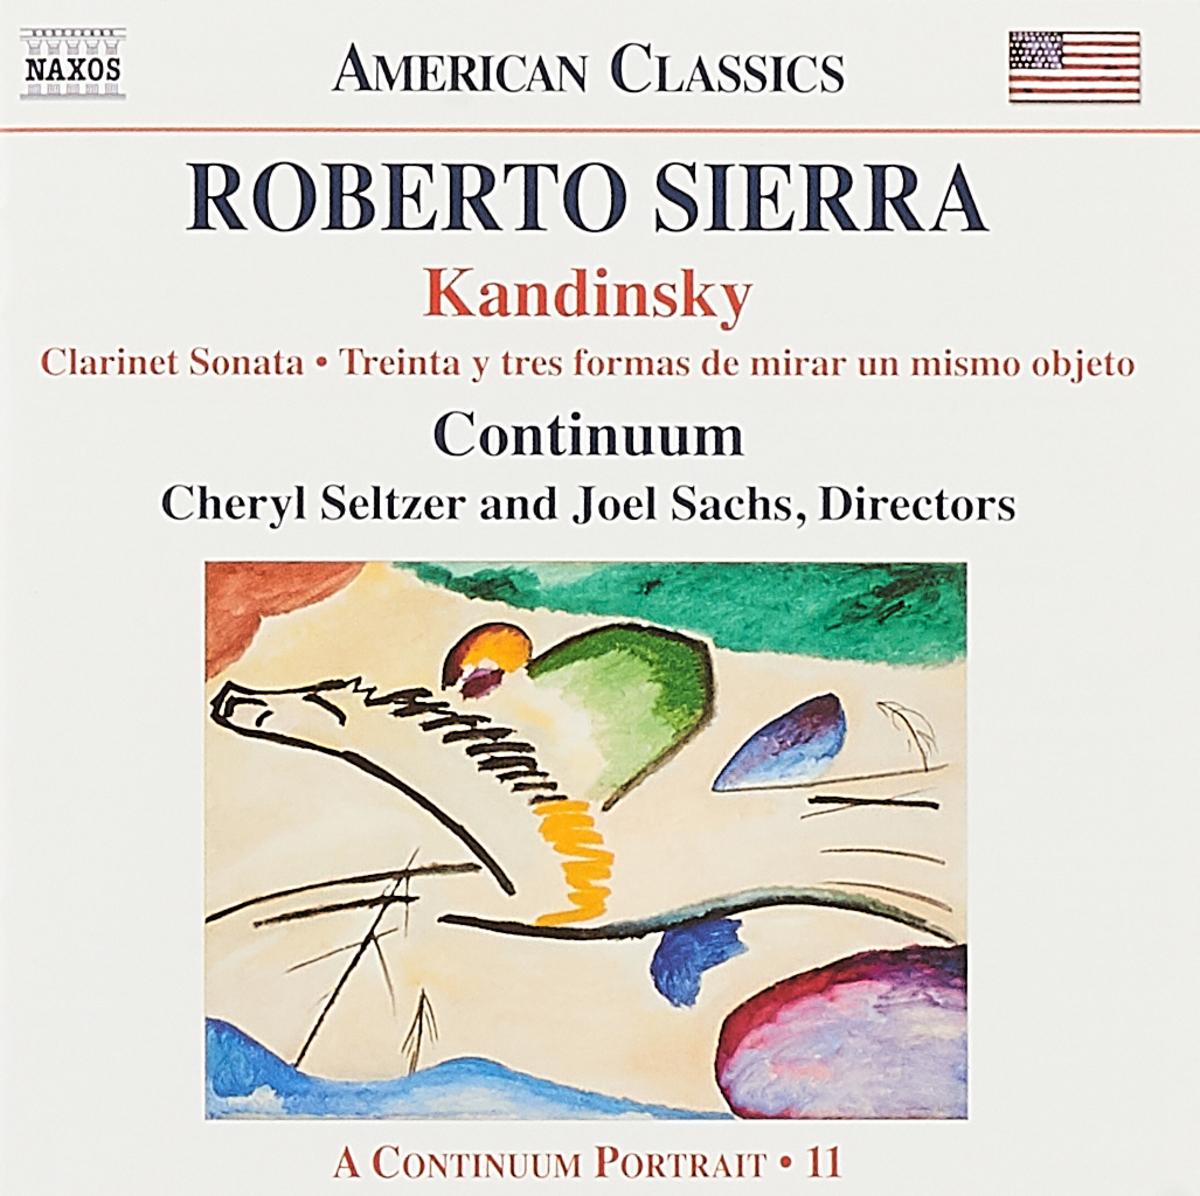 Wassily Kandinsky Kandinsky. Sonata For Clarinet And Piano. Treinta Y Tres Formas De Mirar Un Mismo Objeto mismo ремень